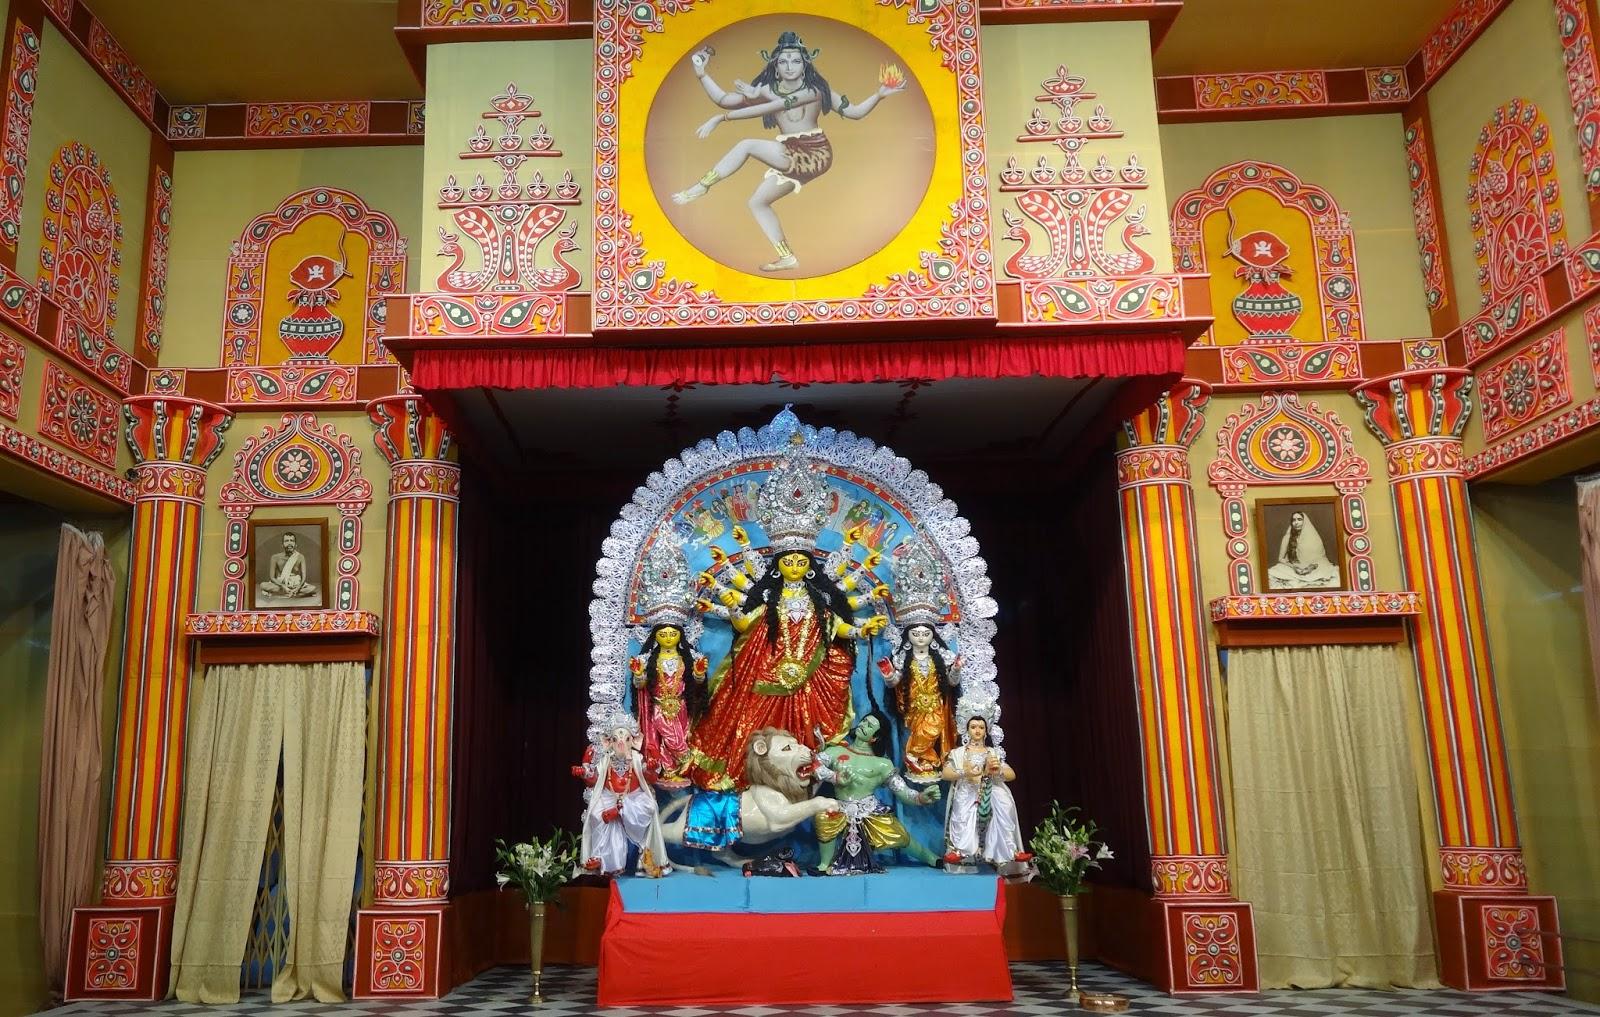 Puja 2014 Durga Puja:2014